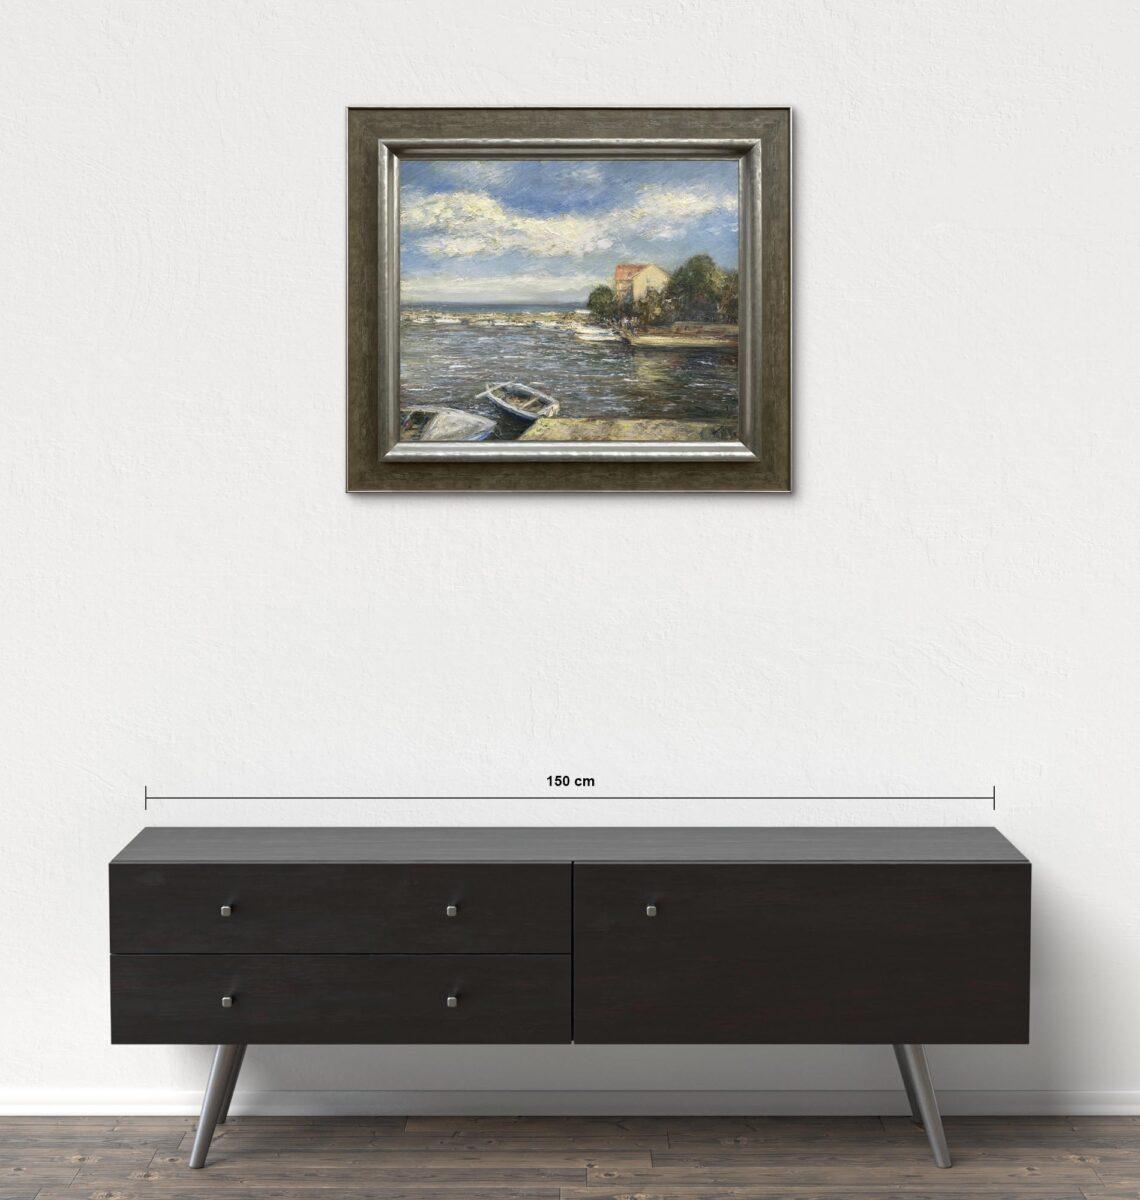 Názov: Ugljan / Rozmery: 50x60 cm / Rok: 2009 / Technika: Olejomaľba